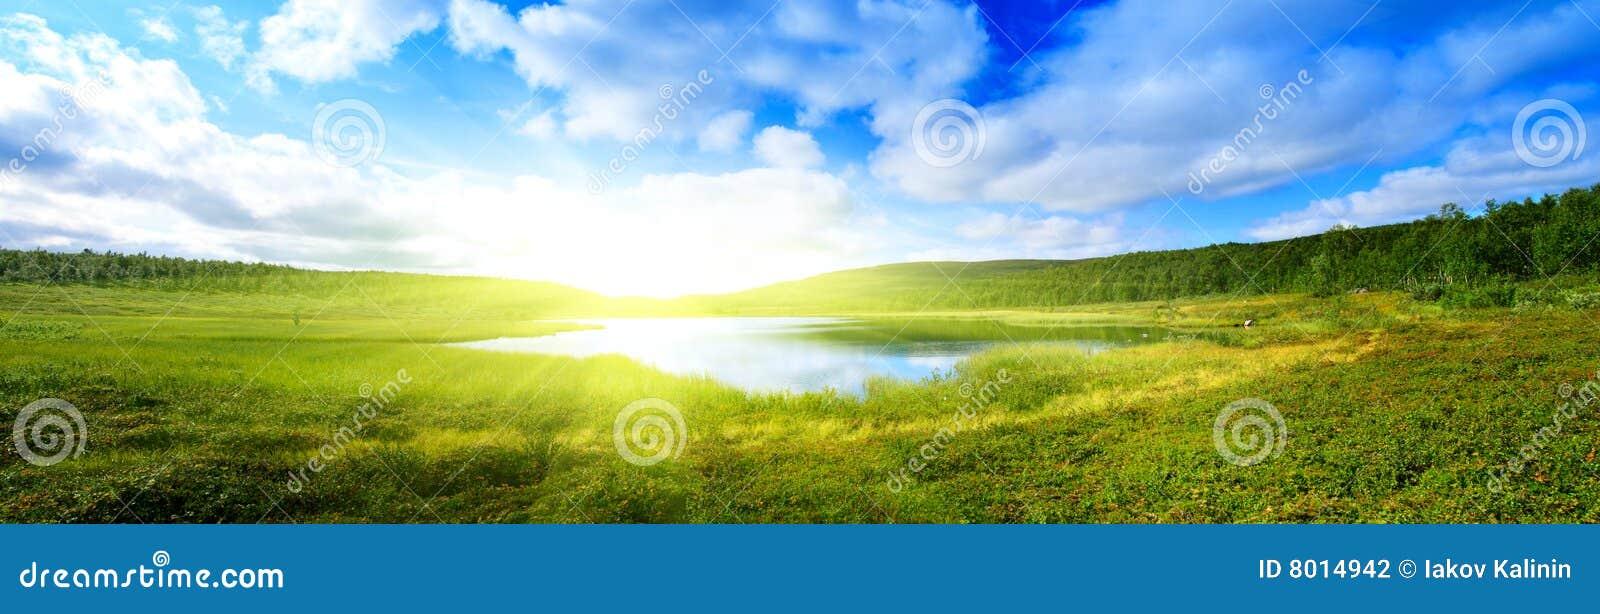 Jeziorny halny północny pano